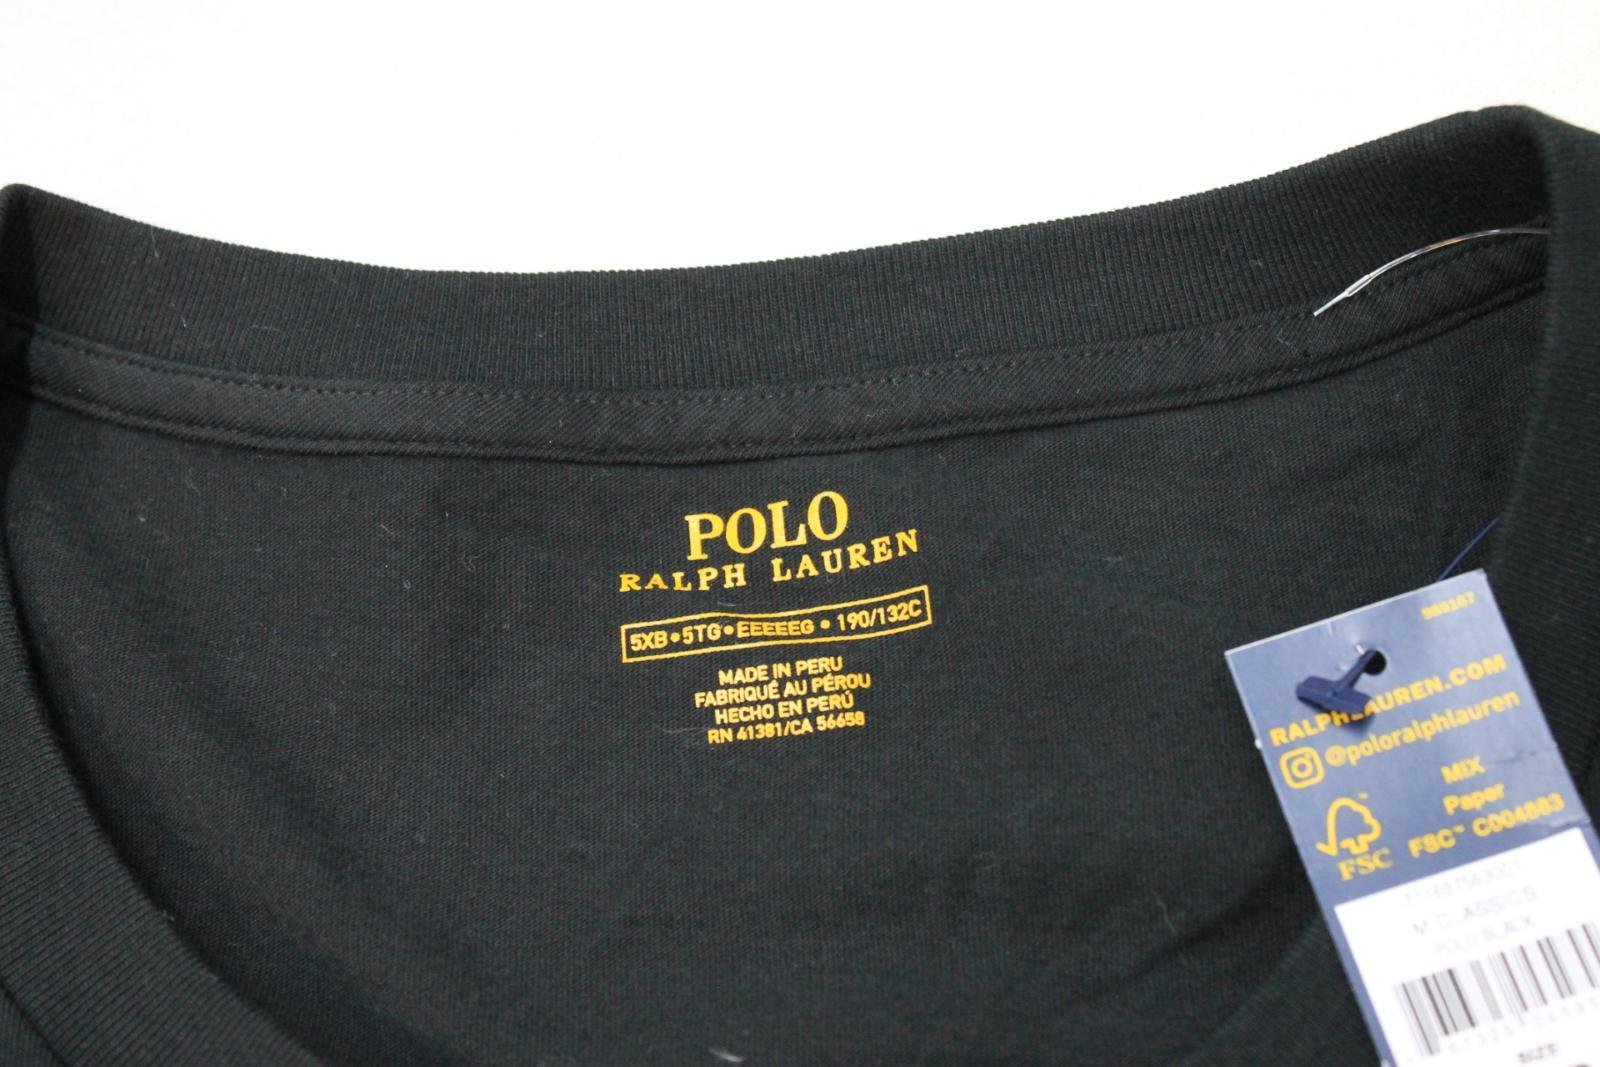 Ralph-Lauren-Polo-para-hombre-de-Big-Pony-Negra-manga-corta-camiseta-tamano-5XB-BNWT miniatura 8